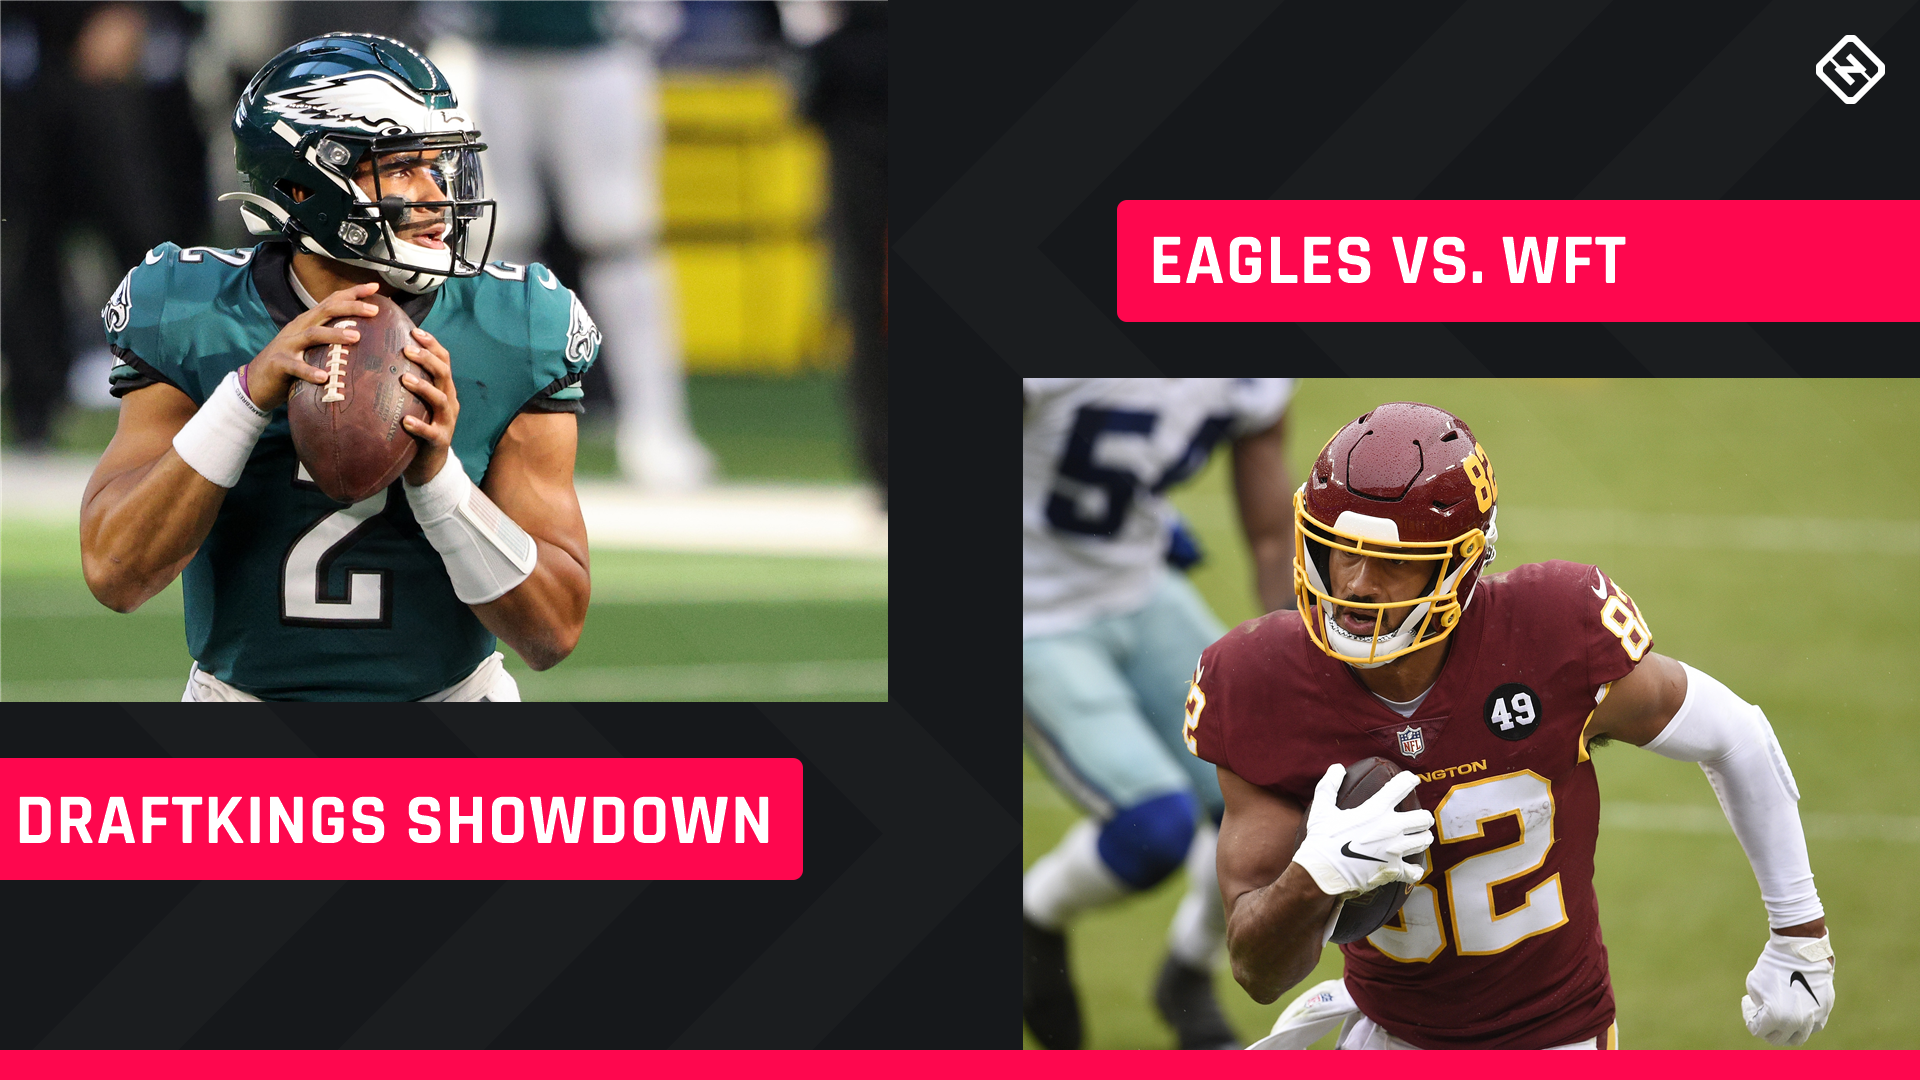 Sunday Night Football DraftKings Picks: NFL DFS lineup conselho para os torneios da Semana 17 Washington-Eagles Showdown